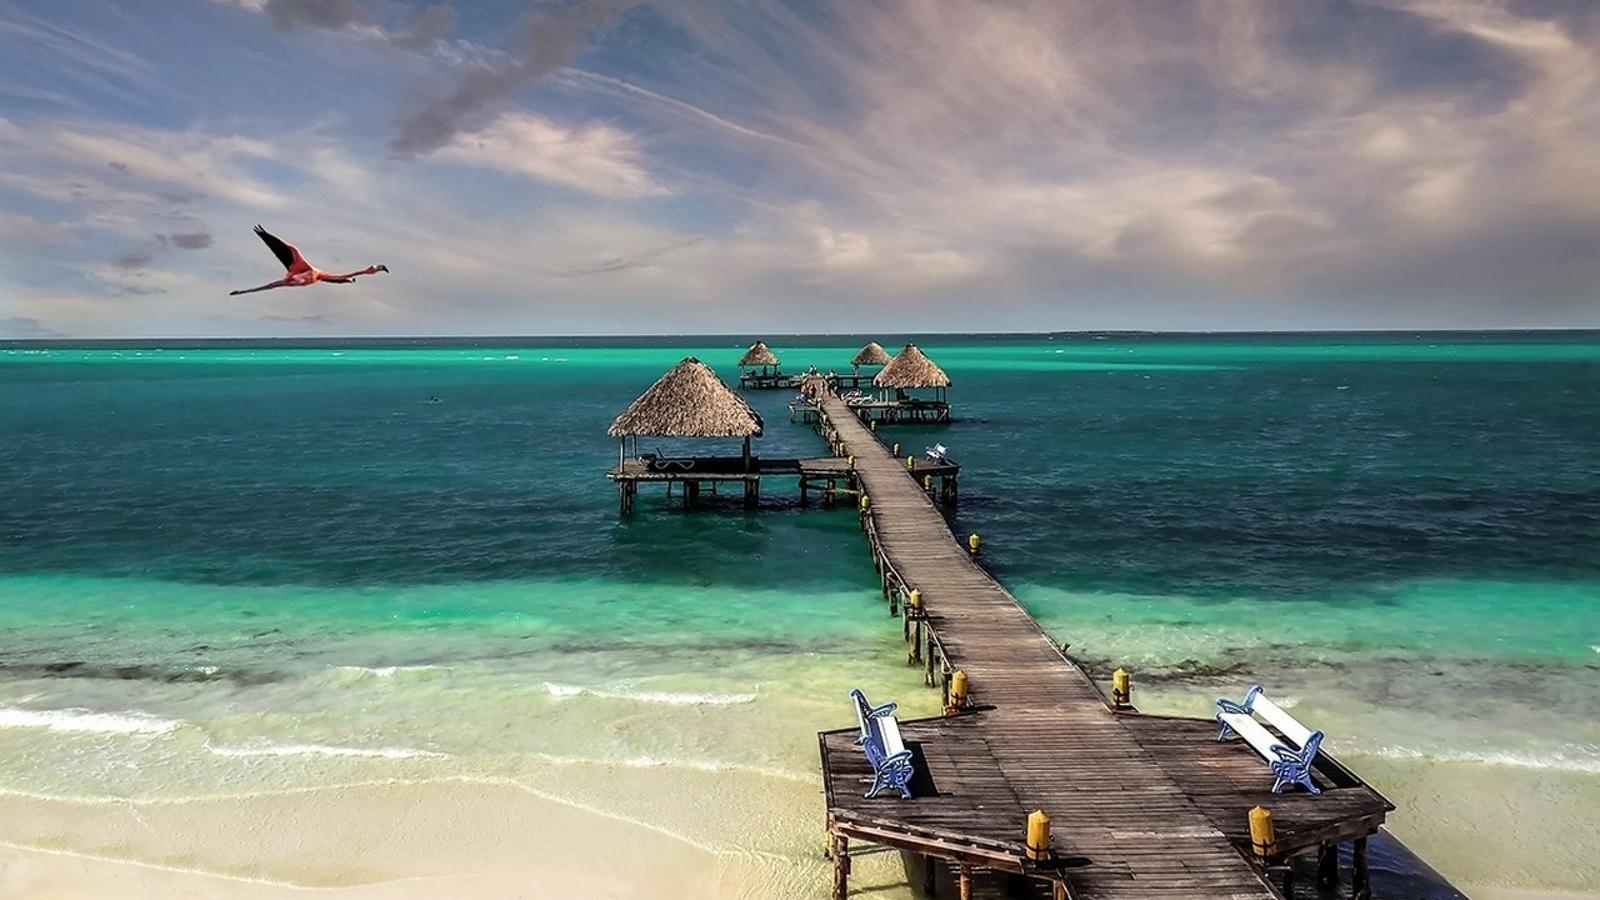 Cuba beach bird sea sand (1600x900)